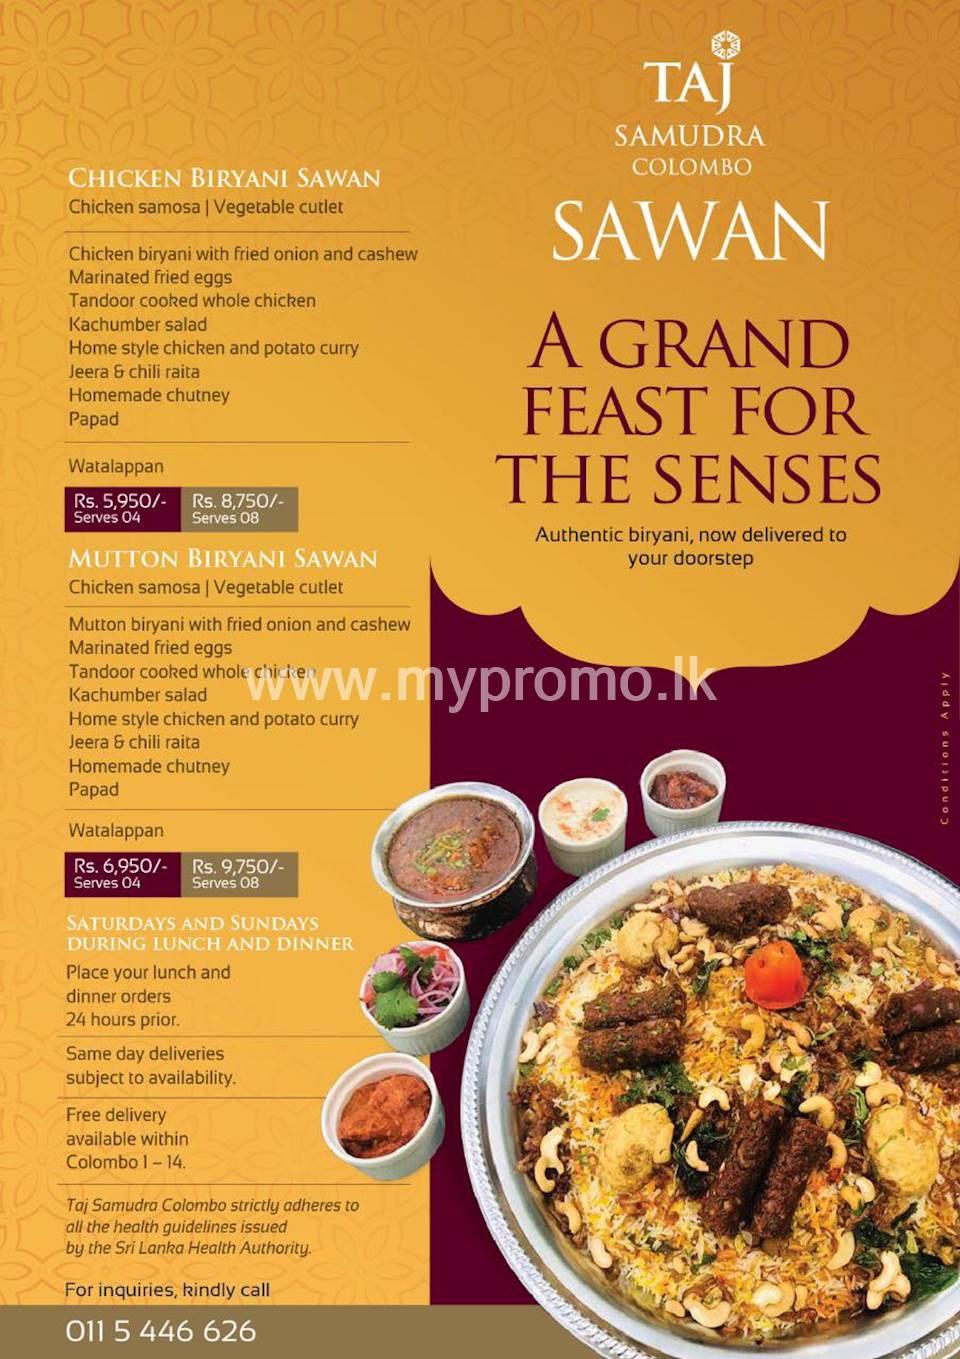 Get your Sawan delivered to your doorstep from Taj Samudra